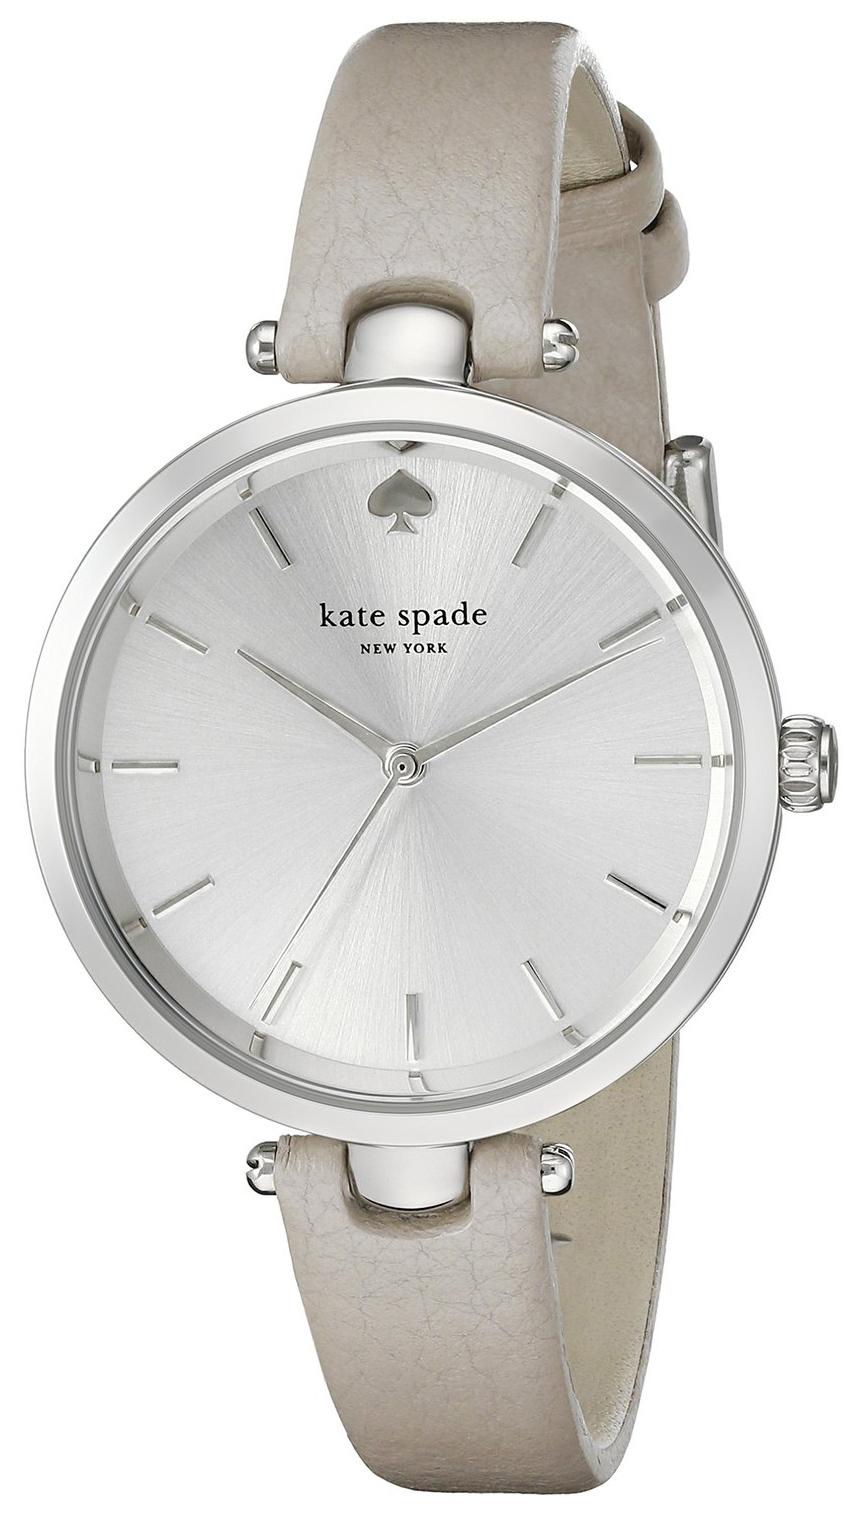 Kate Spade 99999 Dameklokke 1YRU0813 Sølvfarget/Lær Ø34 mm - Kate Spade